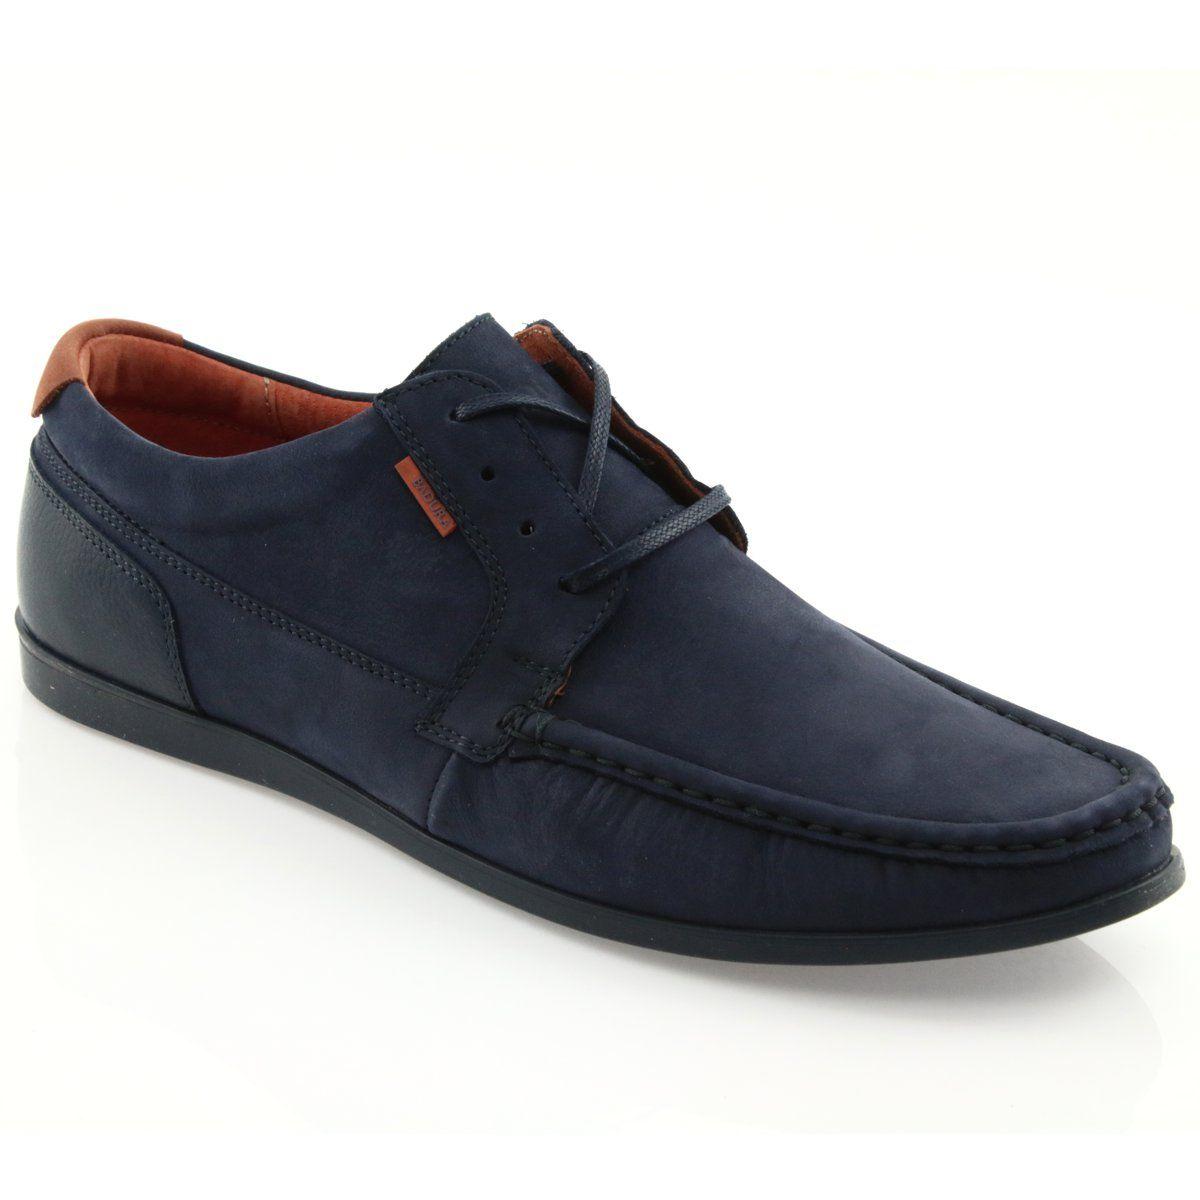 Badura Mokasyny Wiazane 3175 Granatowe Pomaranczowe Dress Shoes Men Dress Shoes Oxford Shoes